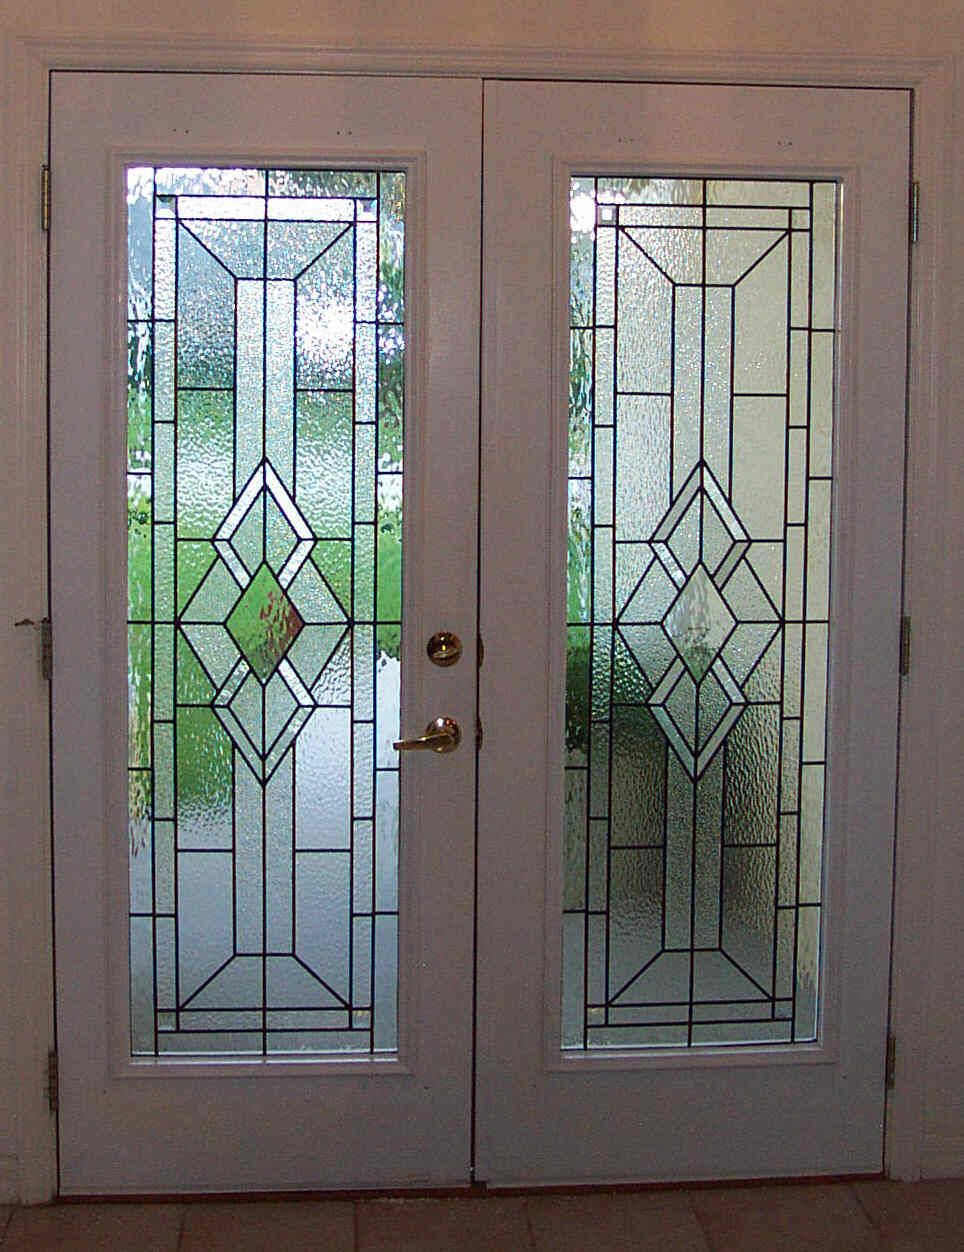 Custom Glass For Front Entry Doors Made By Designer Art Glass Daytona Beach Fl Stained Glass Door Glass Doors Interior Entry Doors With Glass